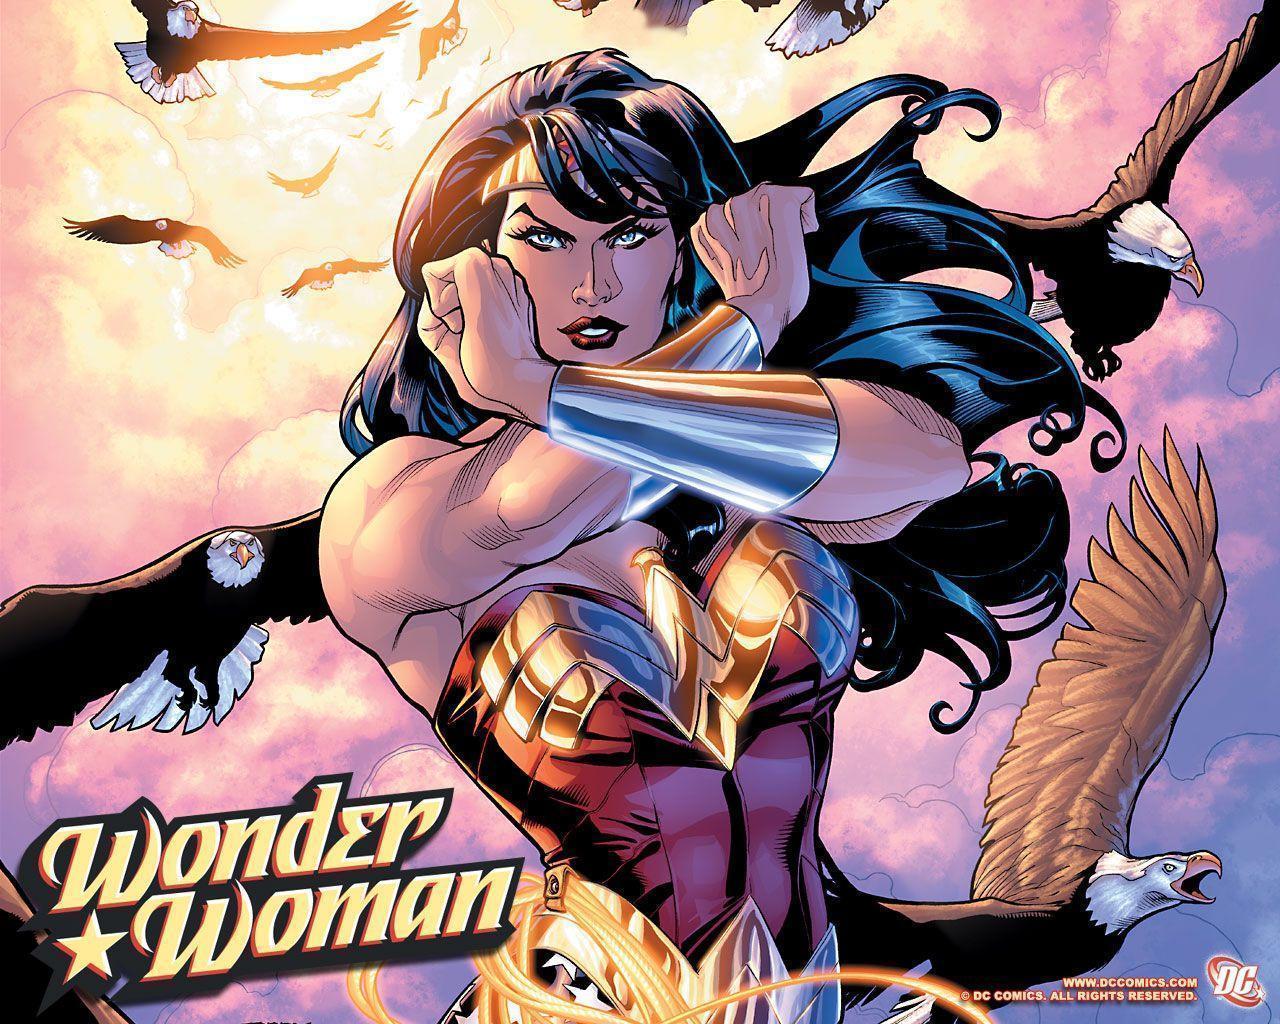 Wonder Woman Computer Wallpapers, Desktop Backgrounds | 1280x1024 ...